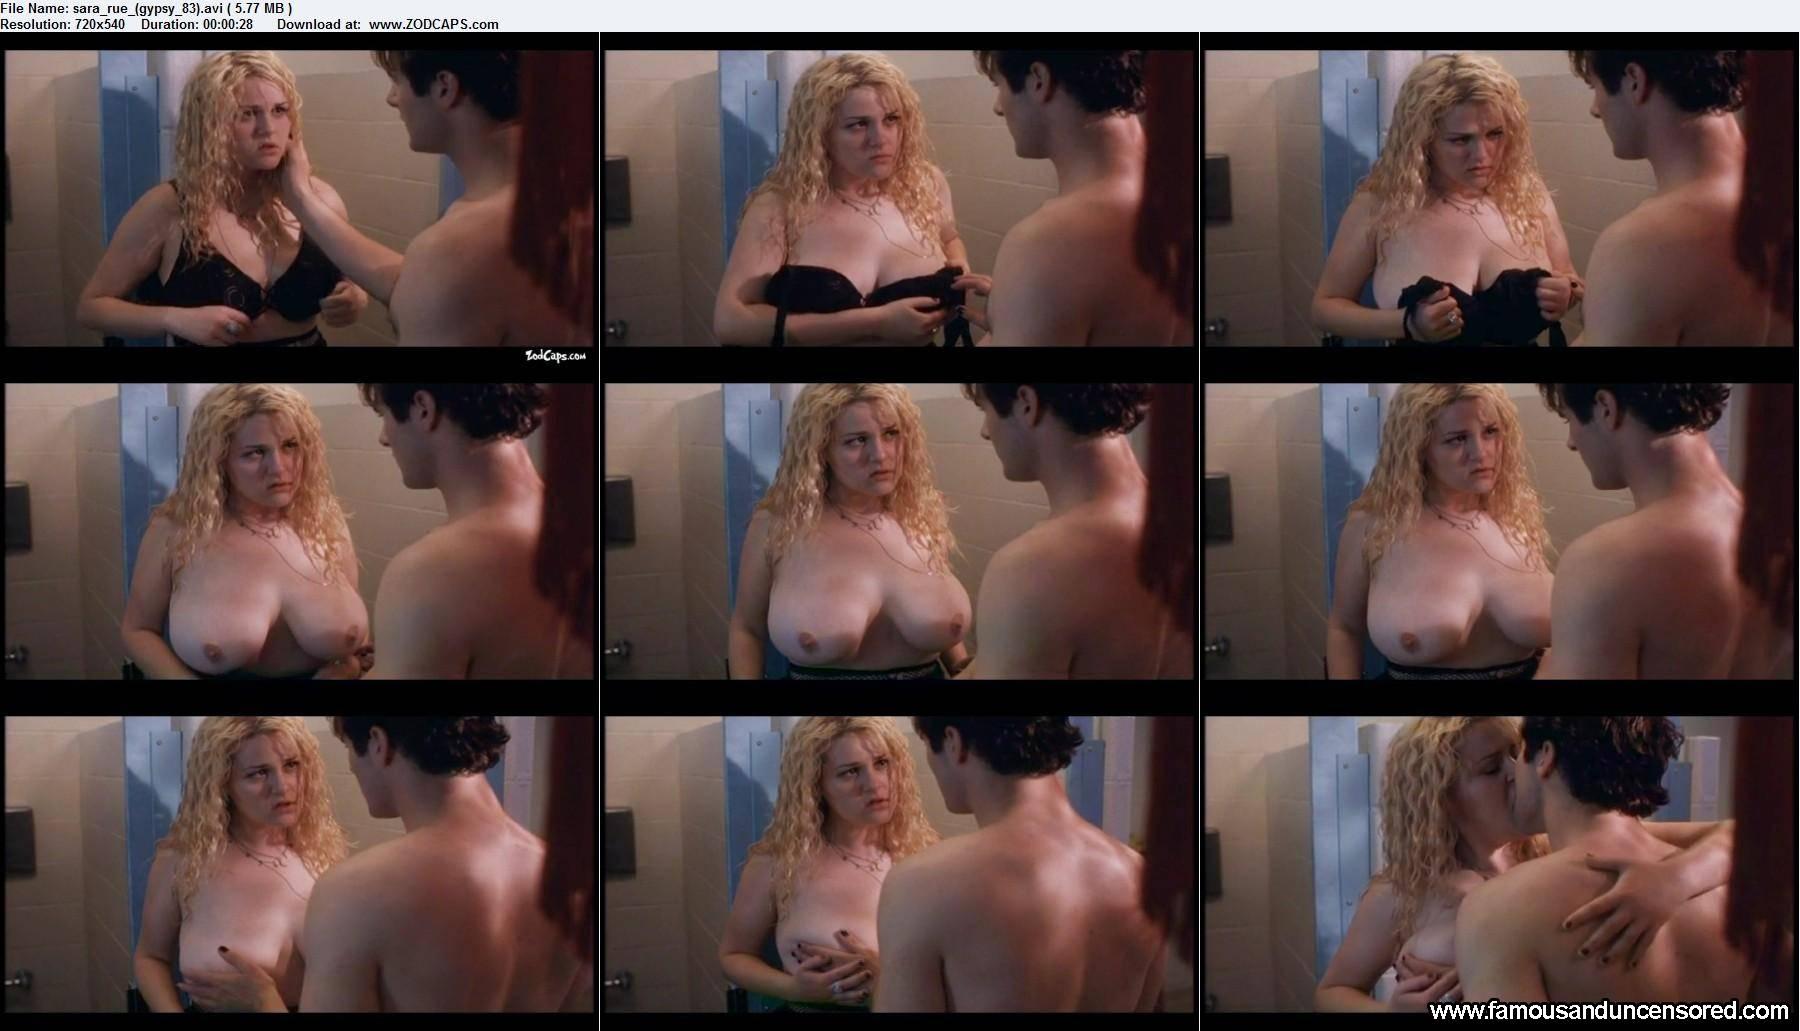 Sara rue nude porn pics leaked, xxx sex photos